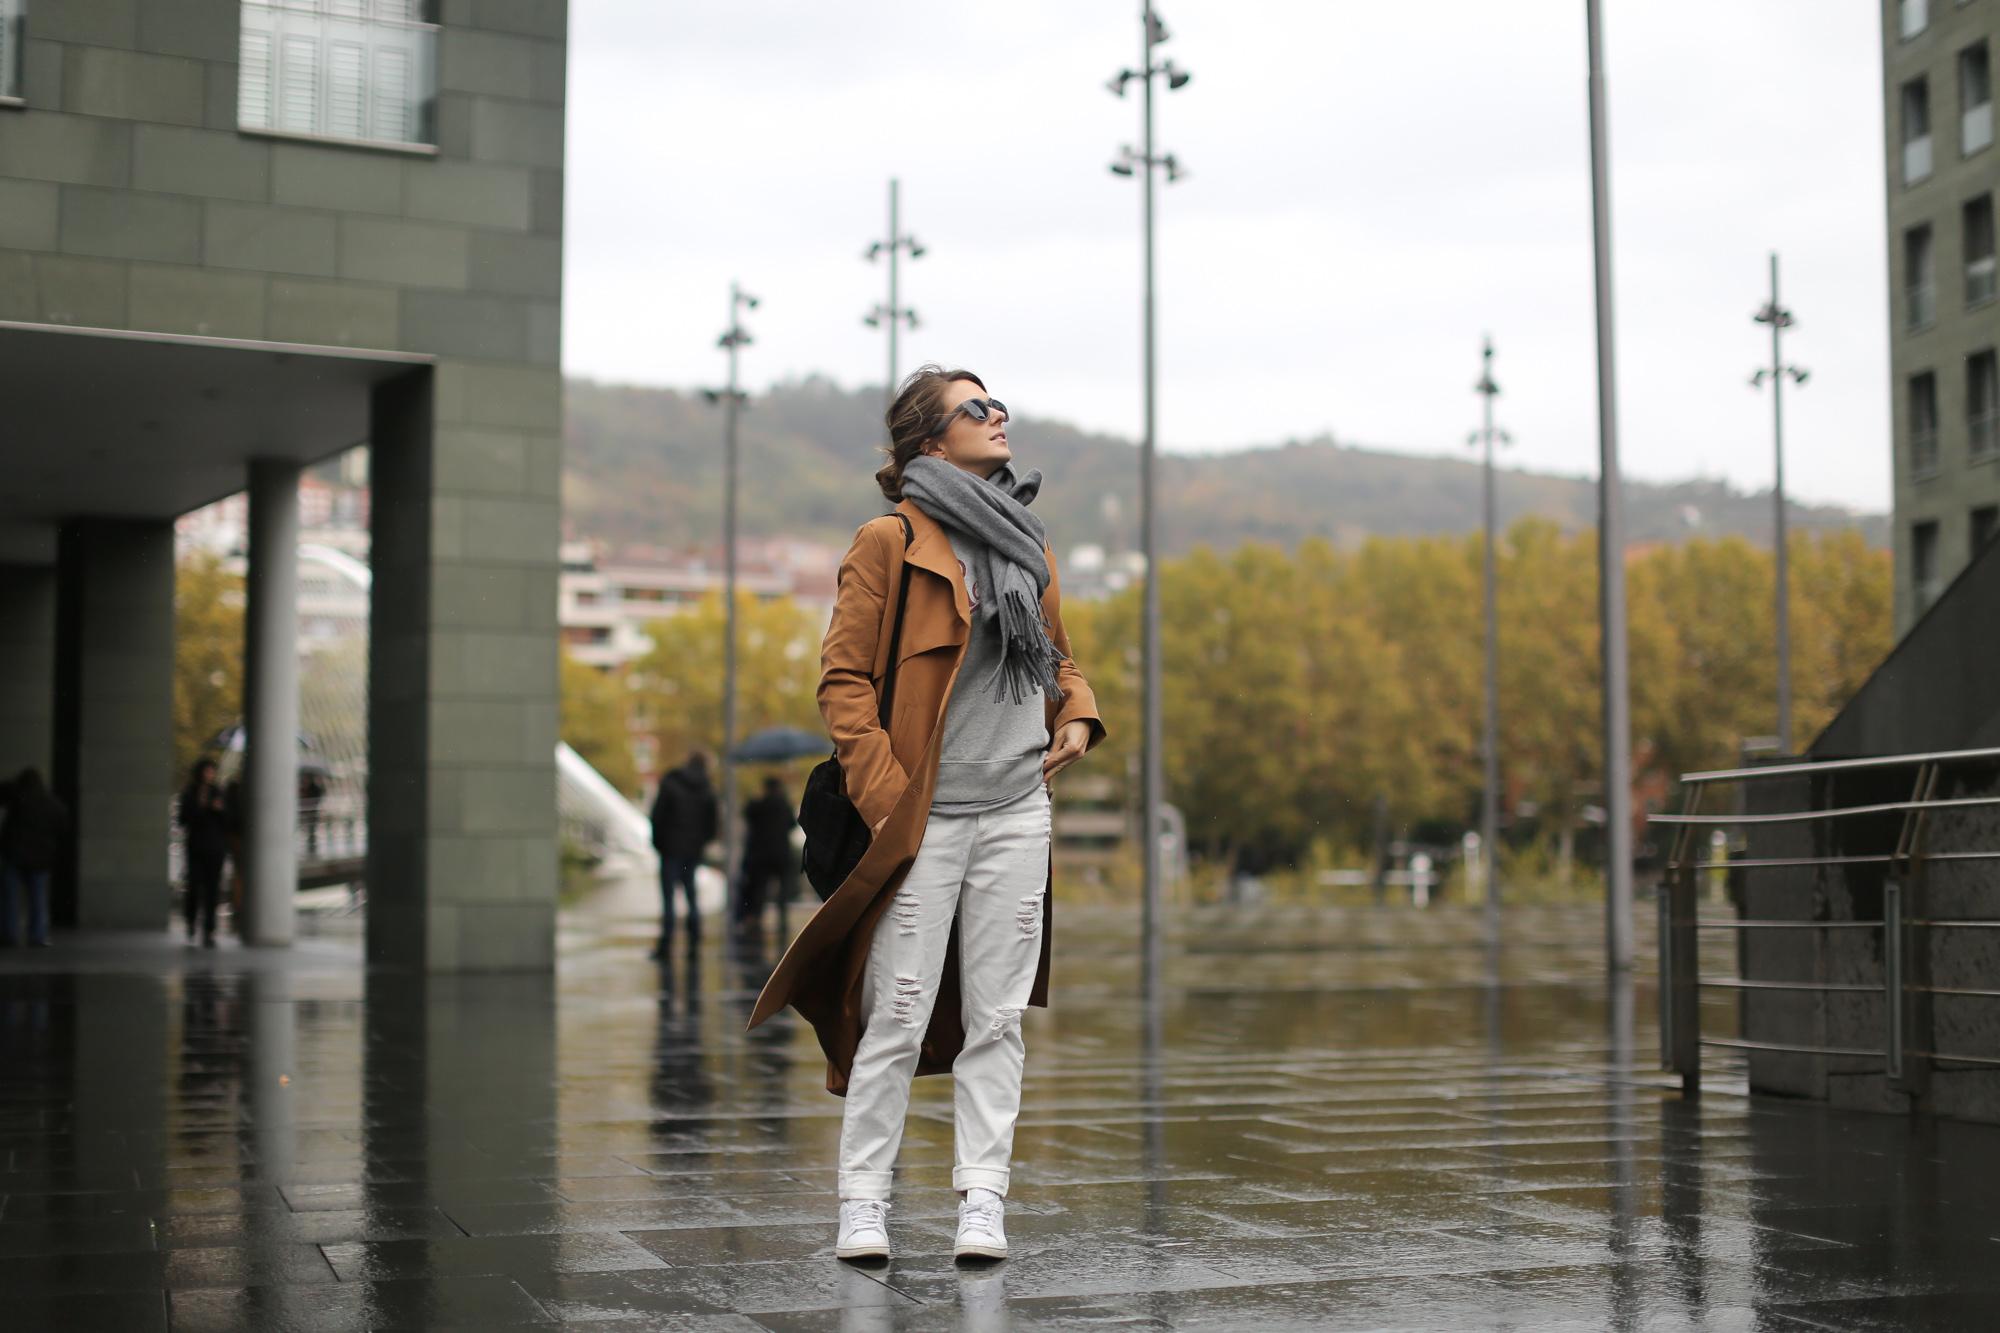 Clochet-streetstyle-isabel-marant-etoile-revolution-sweatshirt-adidas-stan-smith-monki-trench-coat-2